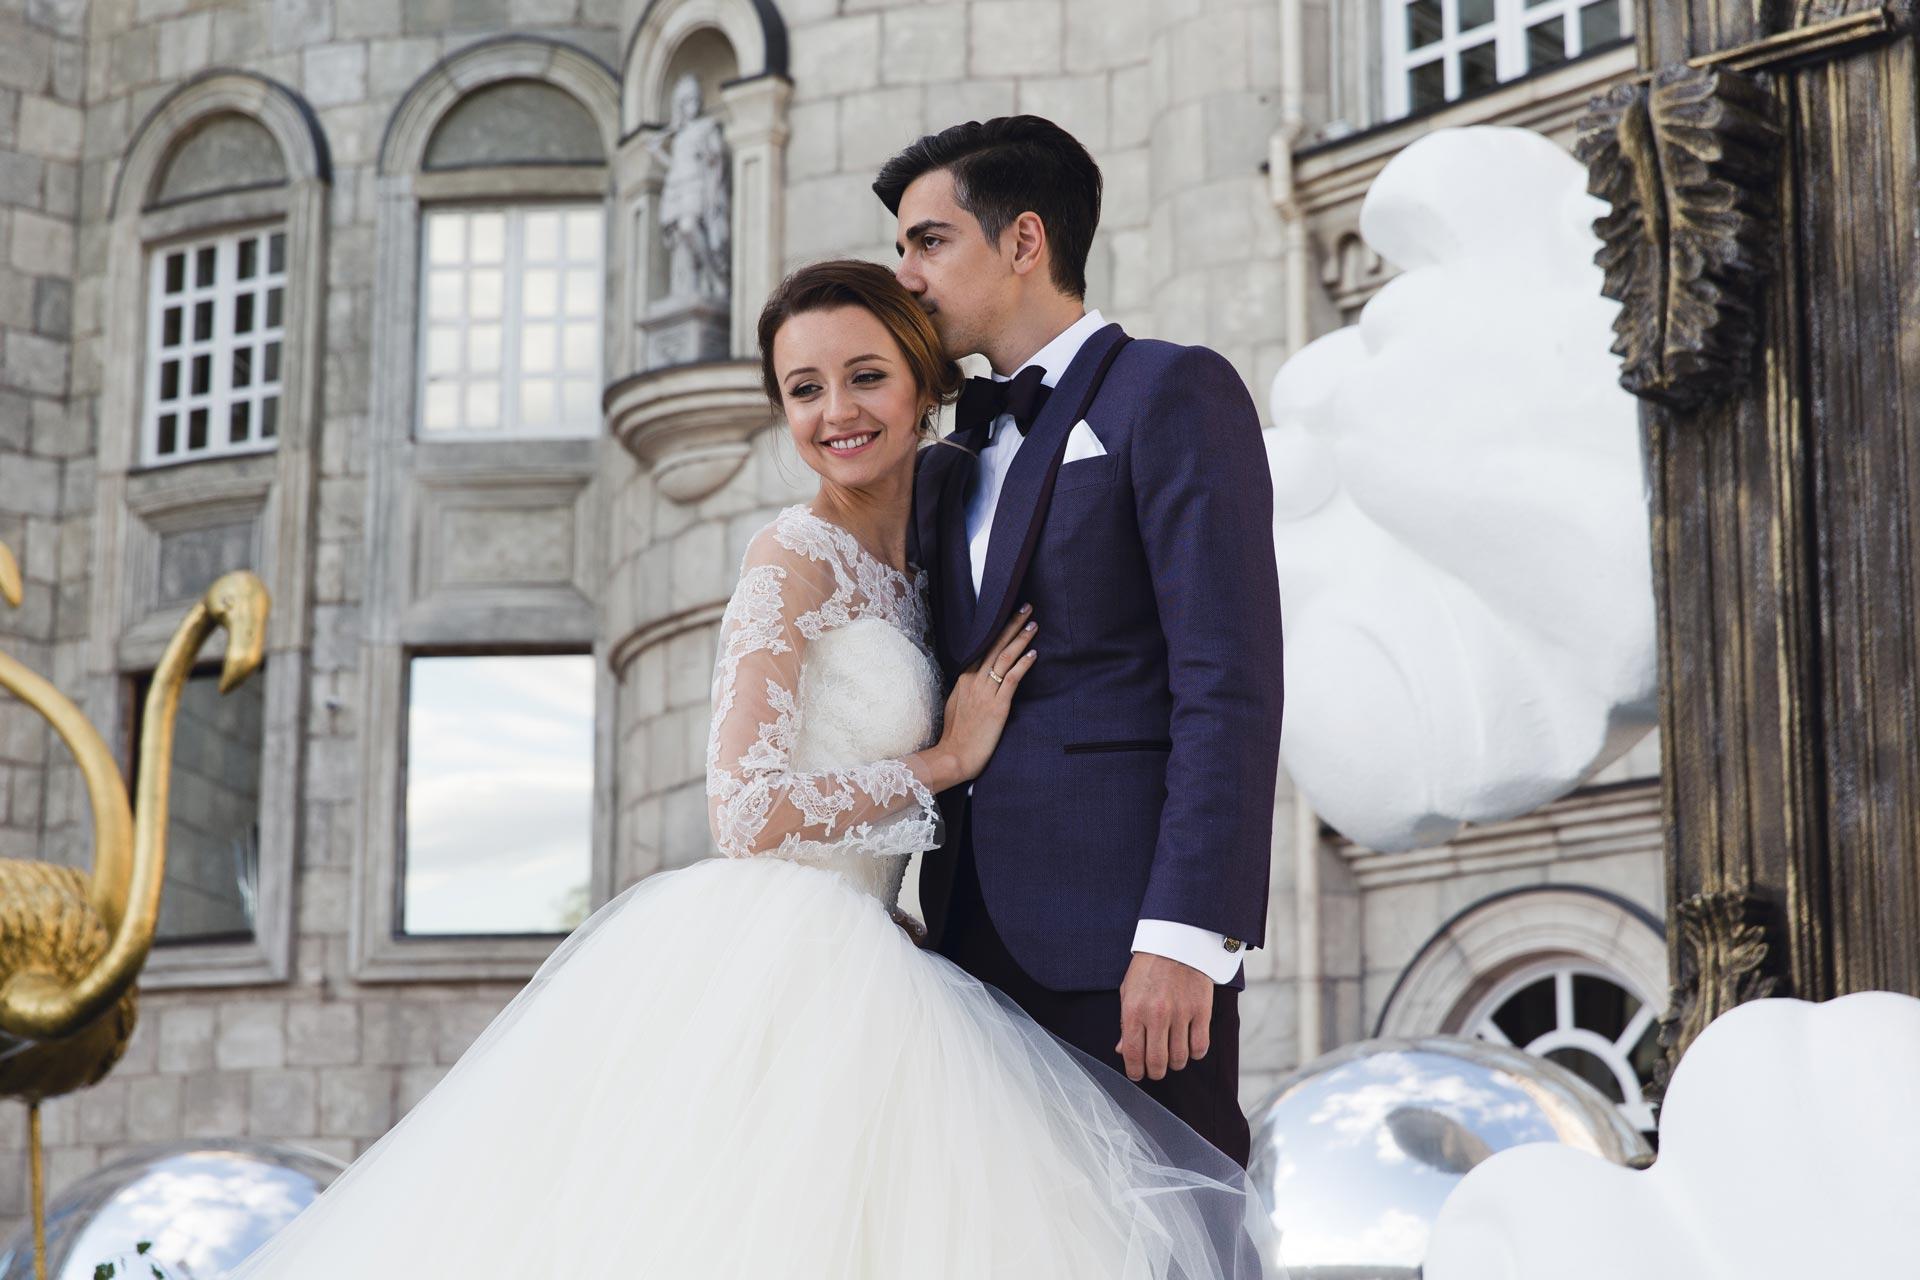 Follow me to. Свадьба Натальи и Мурада Османн фото 5